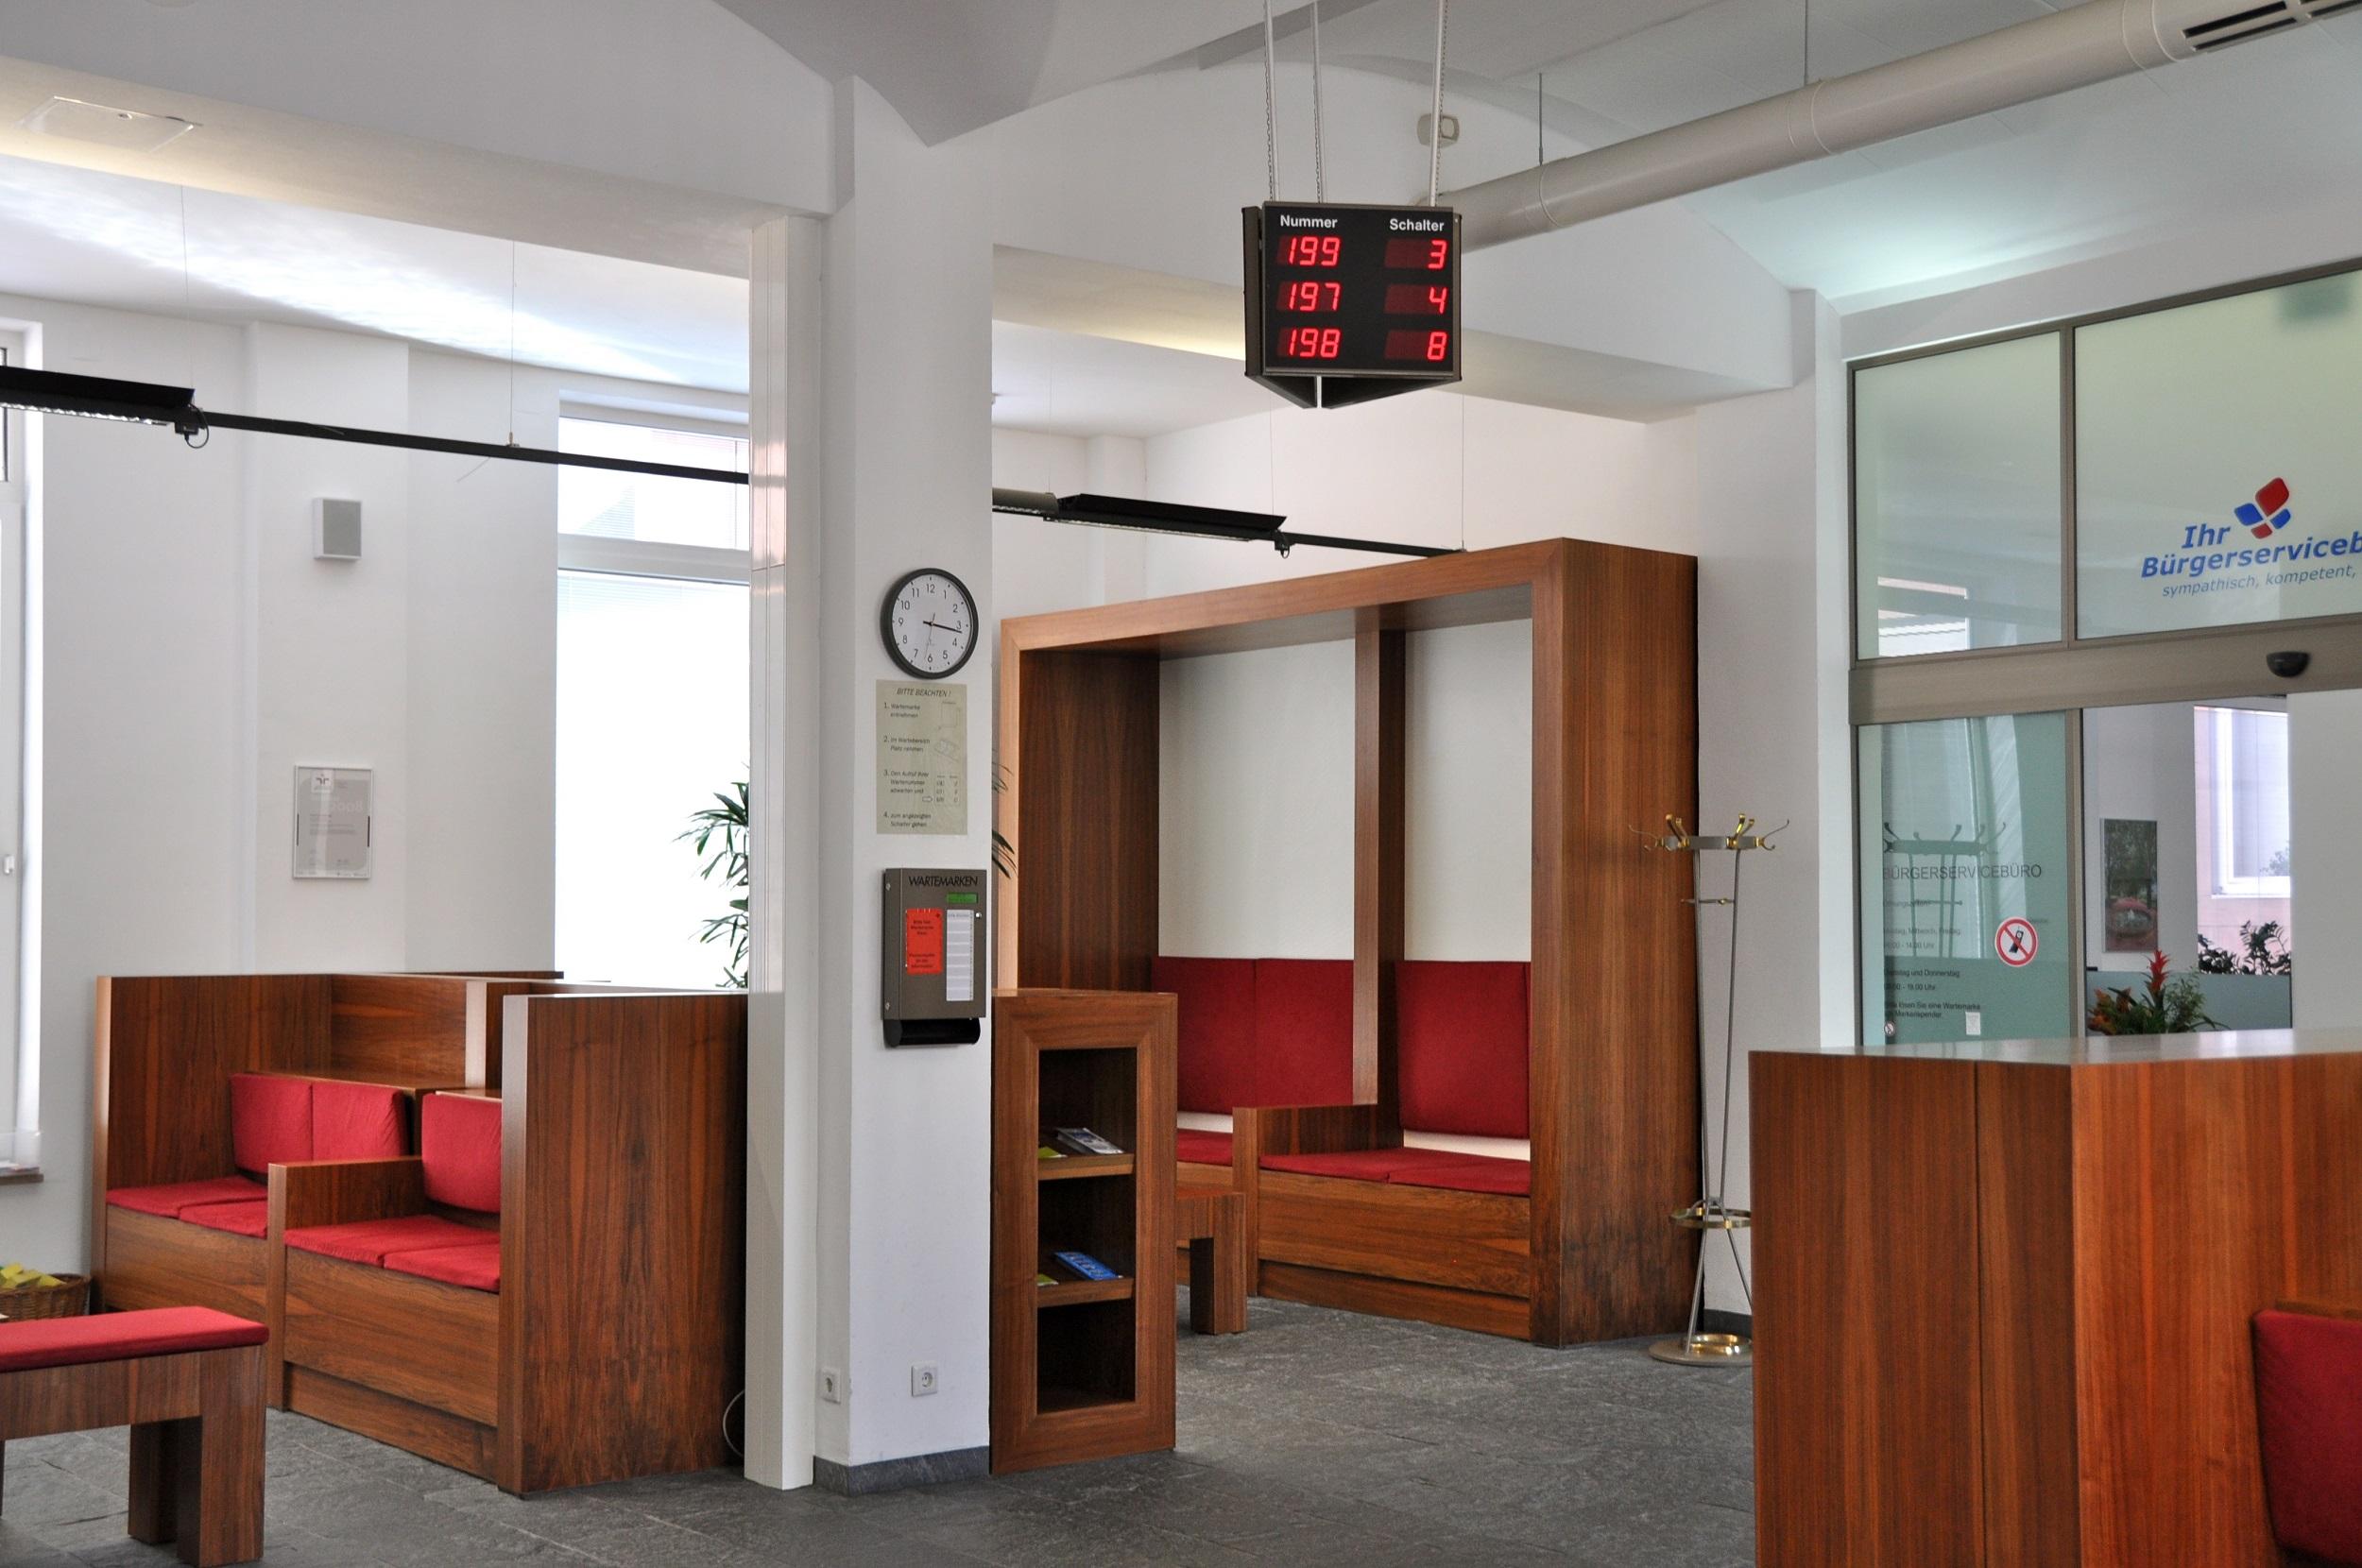 Blick in Wartezone des Bürgerservicebüros